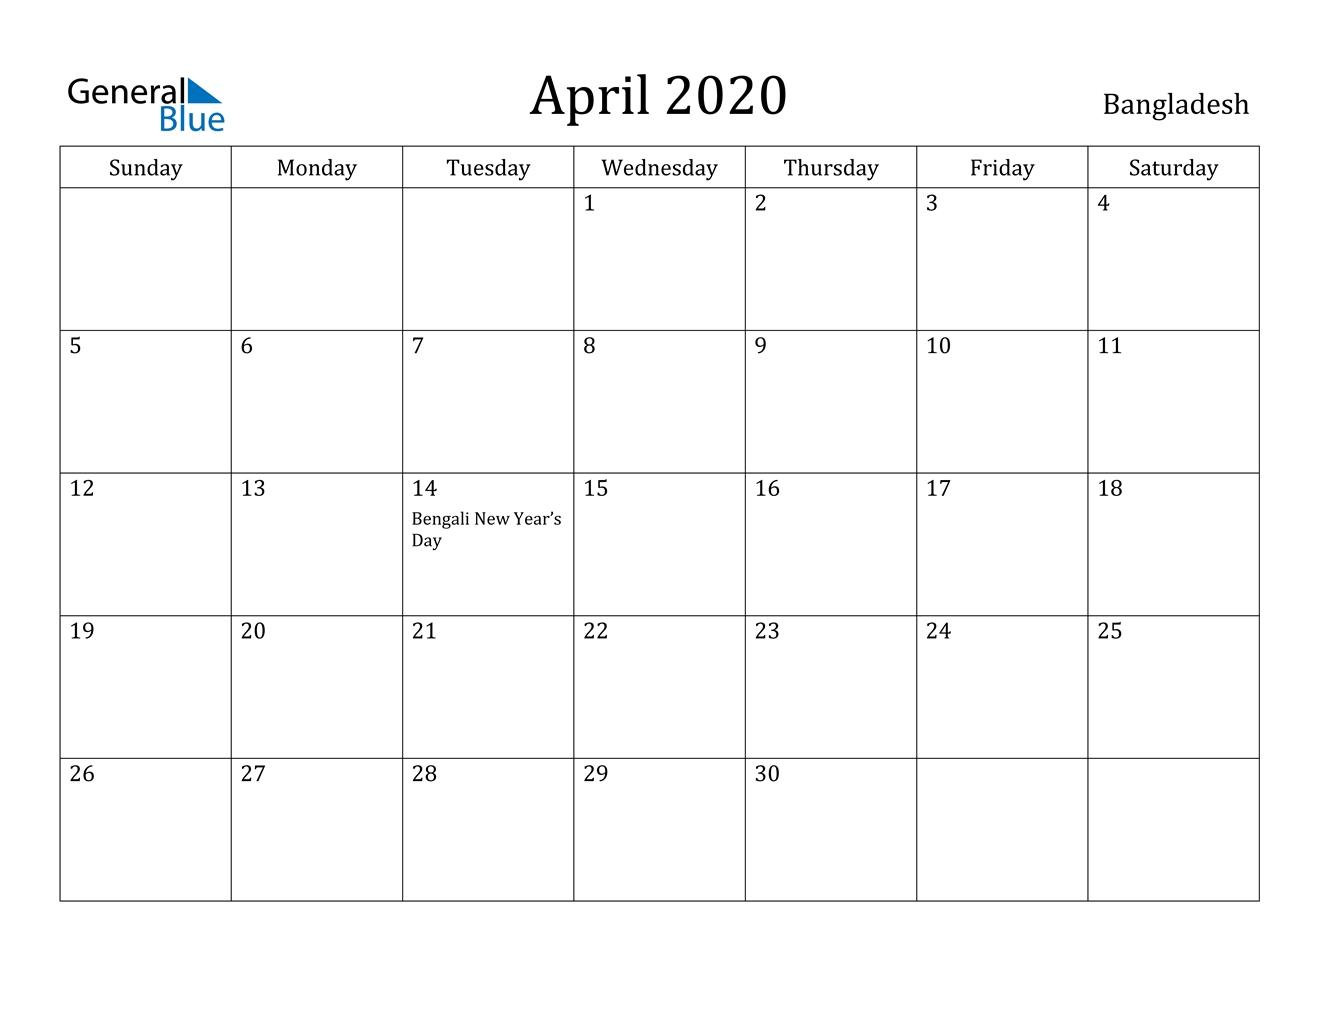 April 2020 Calendar - Bangladesh regarding 2020 Year Calendar Printable Free Bangla